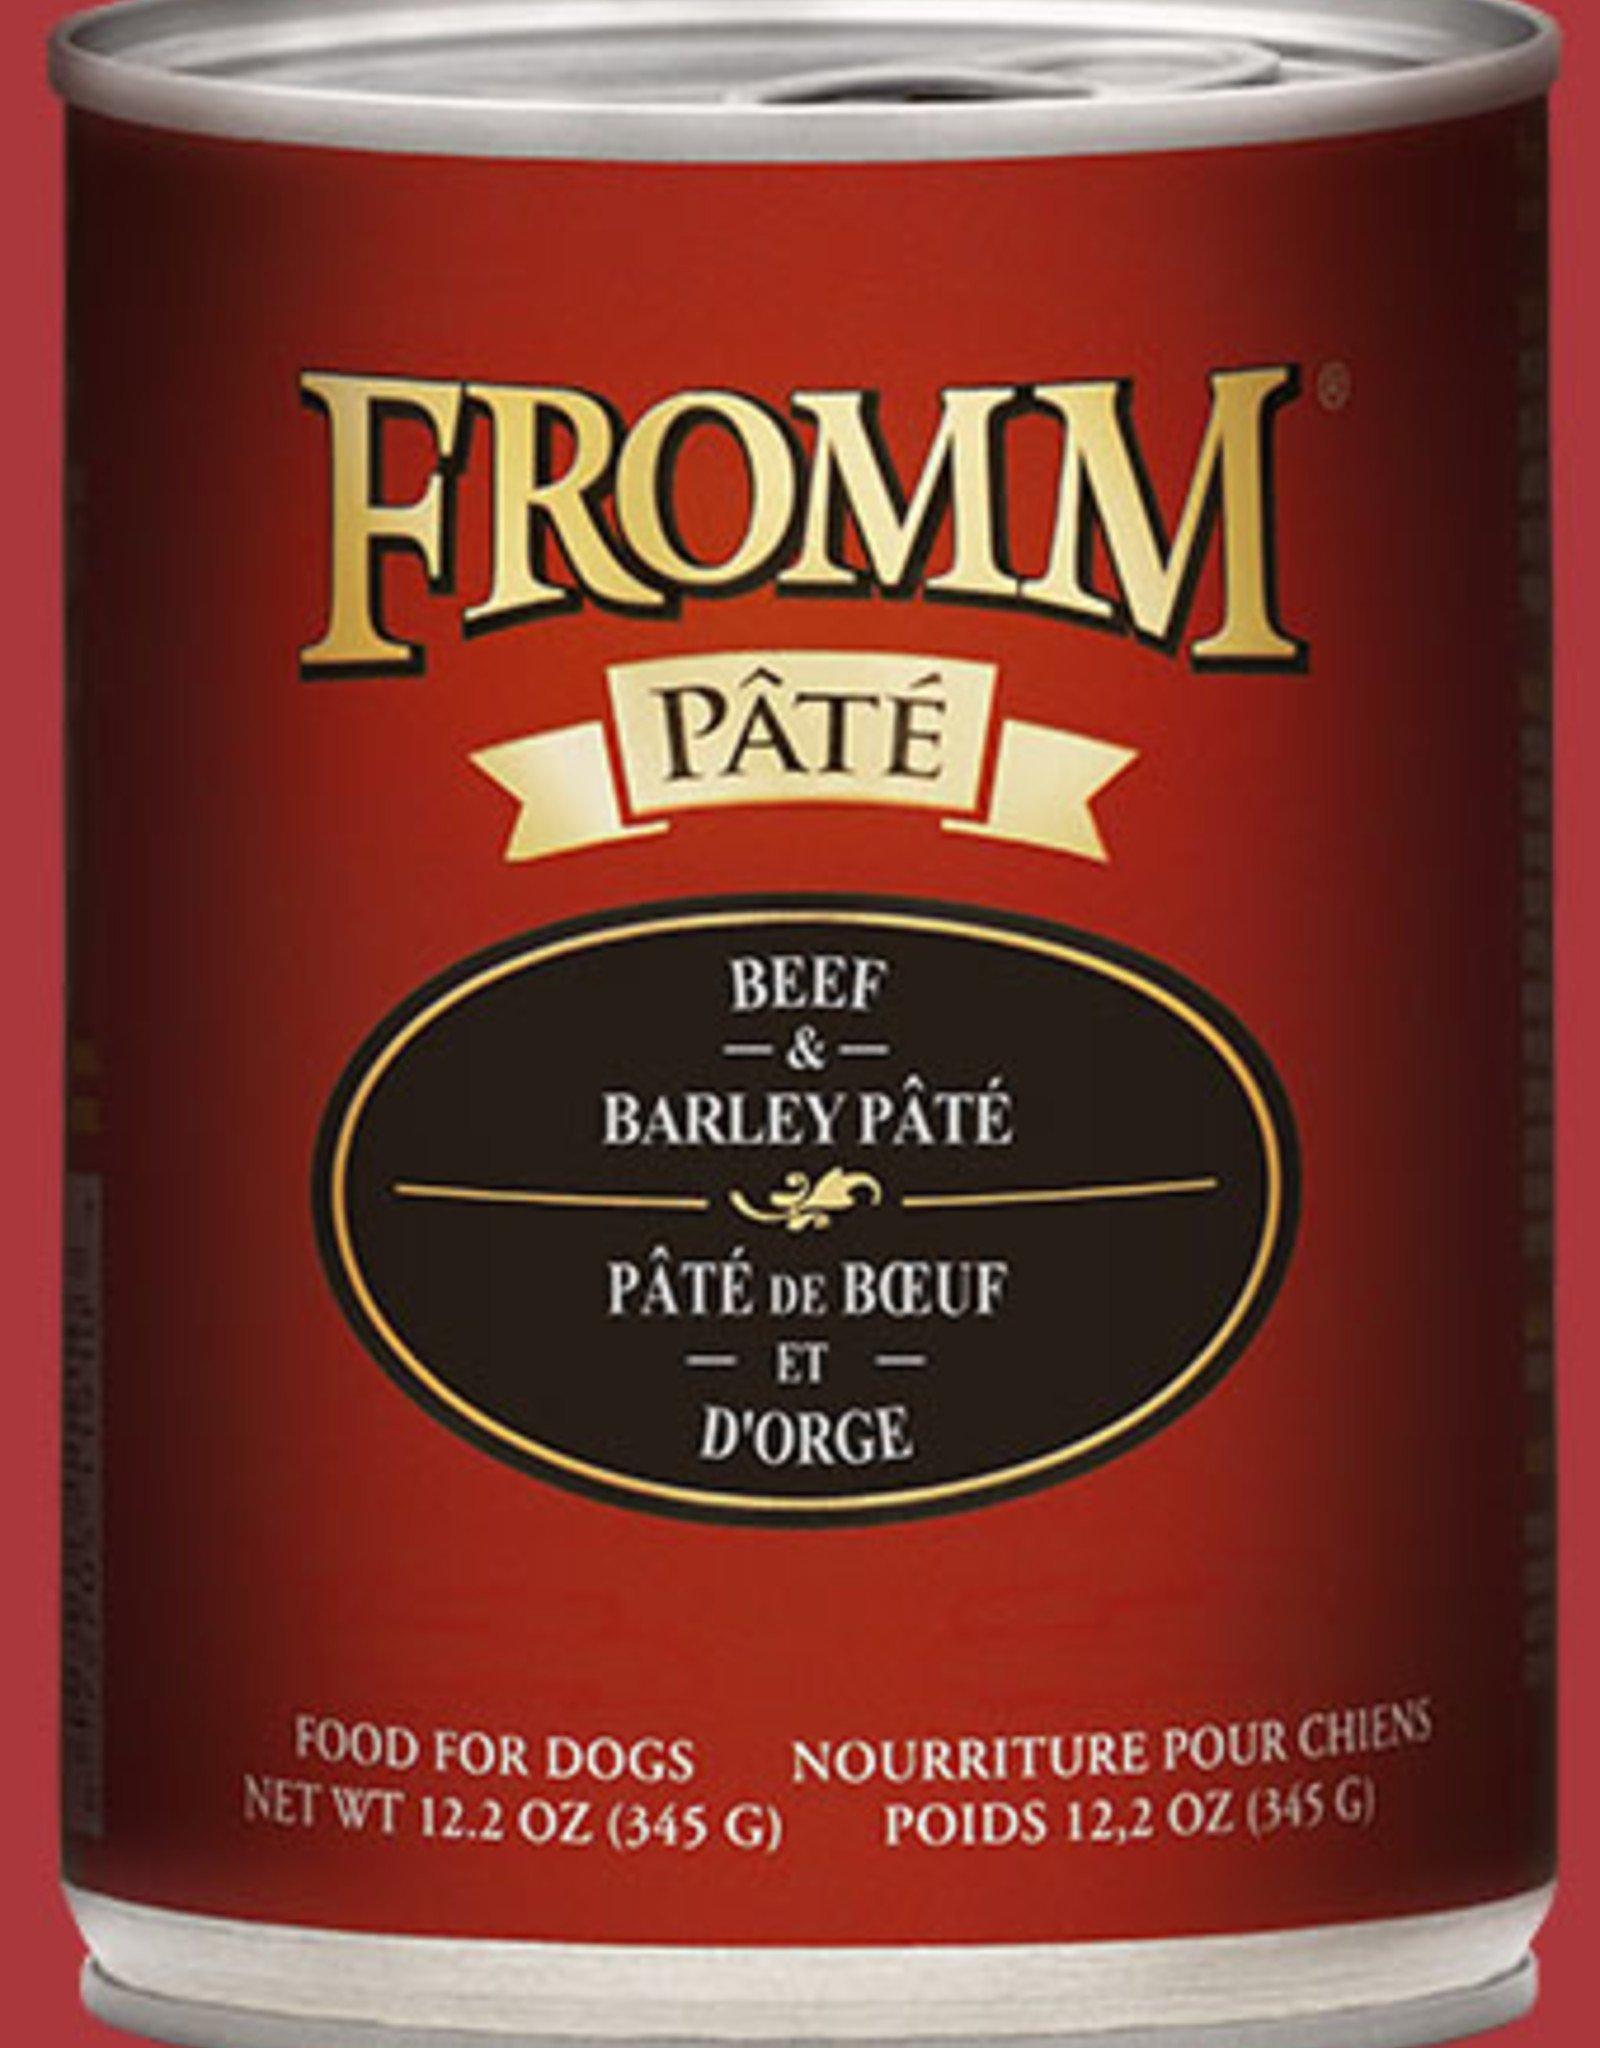 Fromm Beef & Barley Pate 12oz